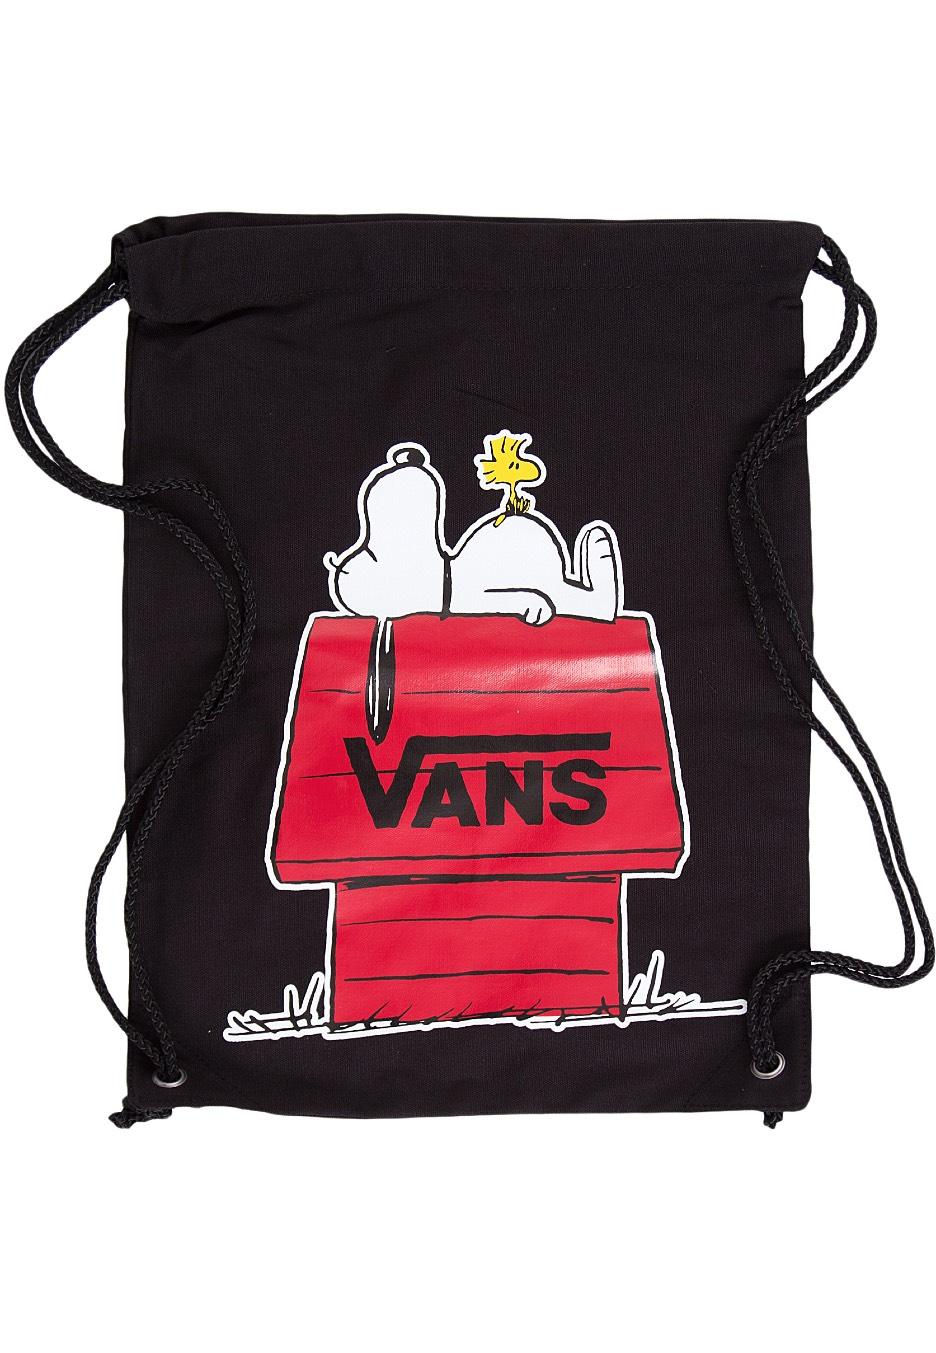 cd51b6b10c Vans X Peanuts - Peanuts Benched Novelty - Backpack - Impericon.com UK